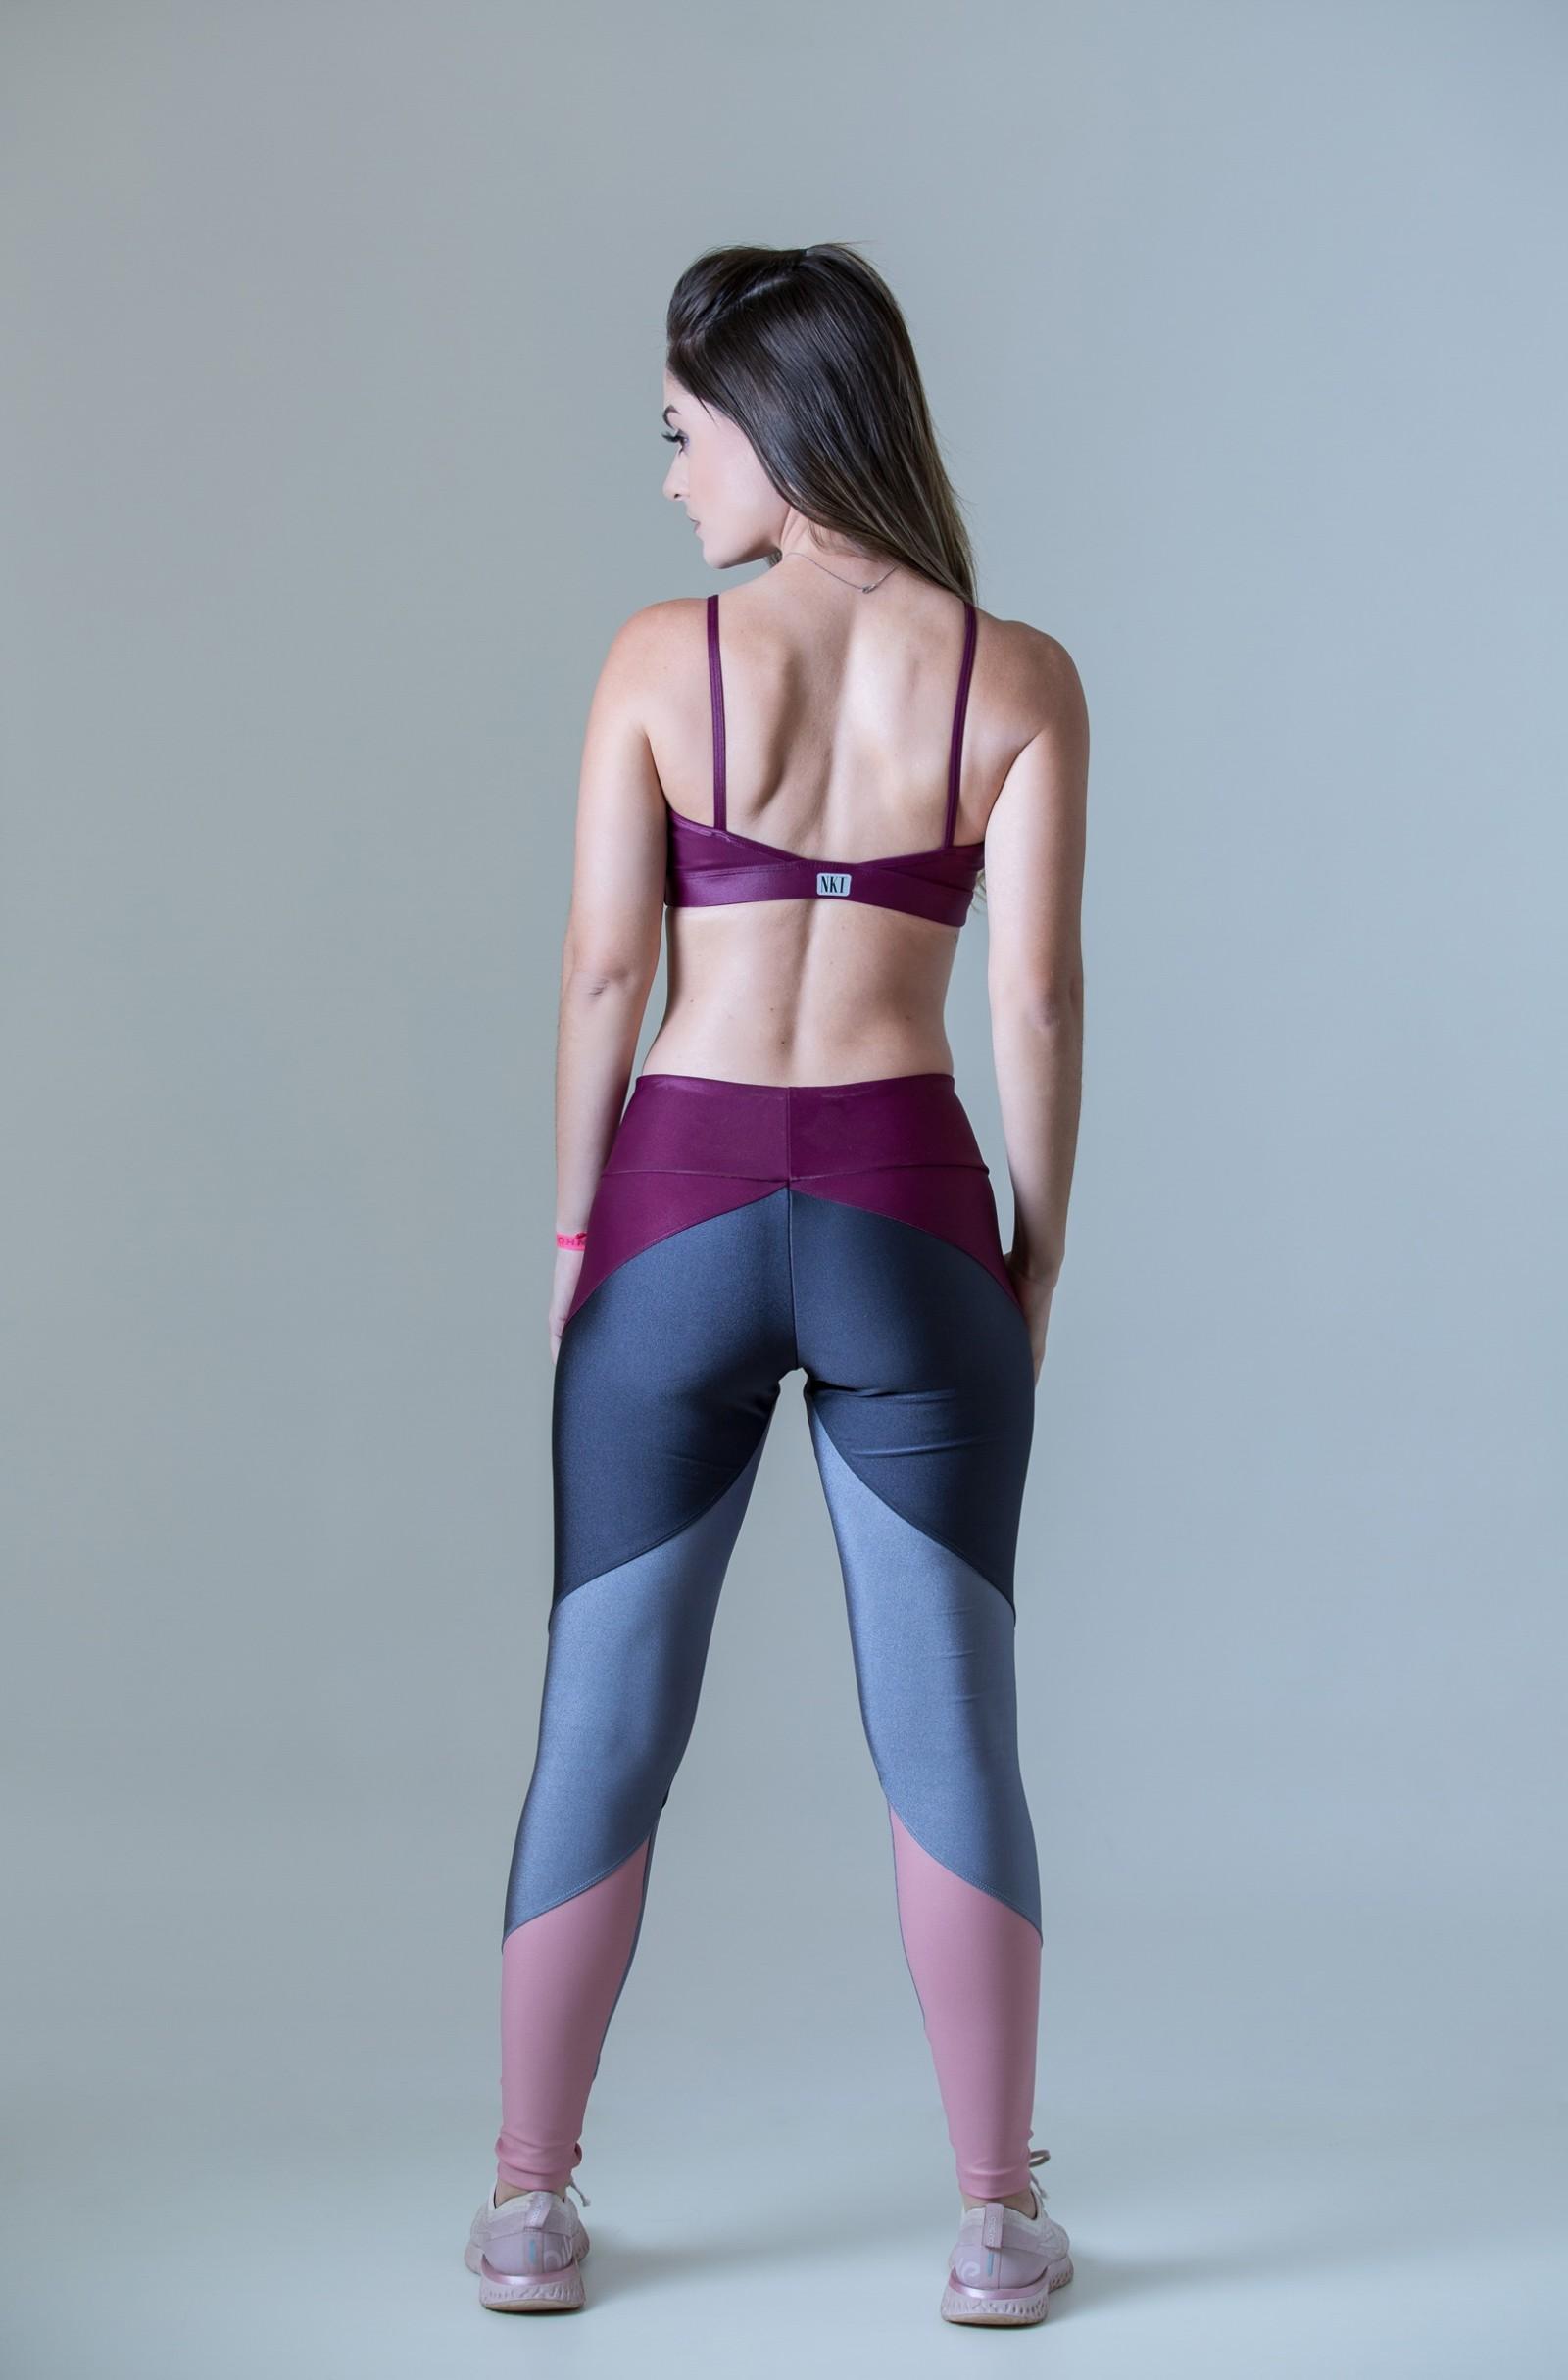 Top Profusion Lacca, Coleção Plenitude - NKT Fitwear Moda Fitness